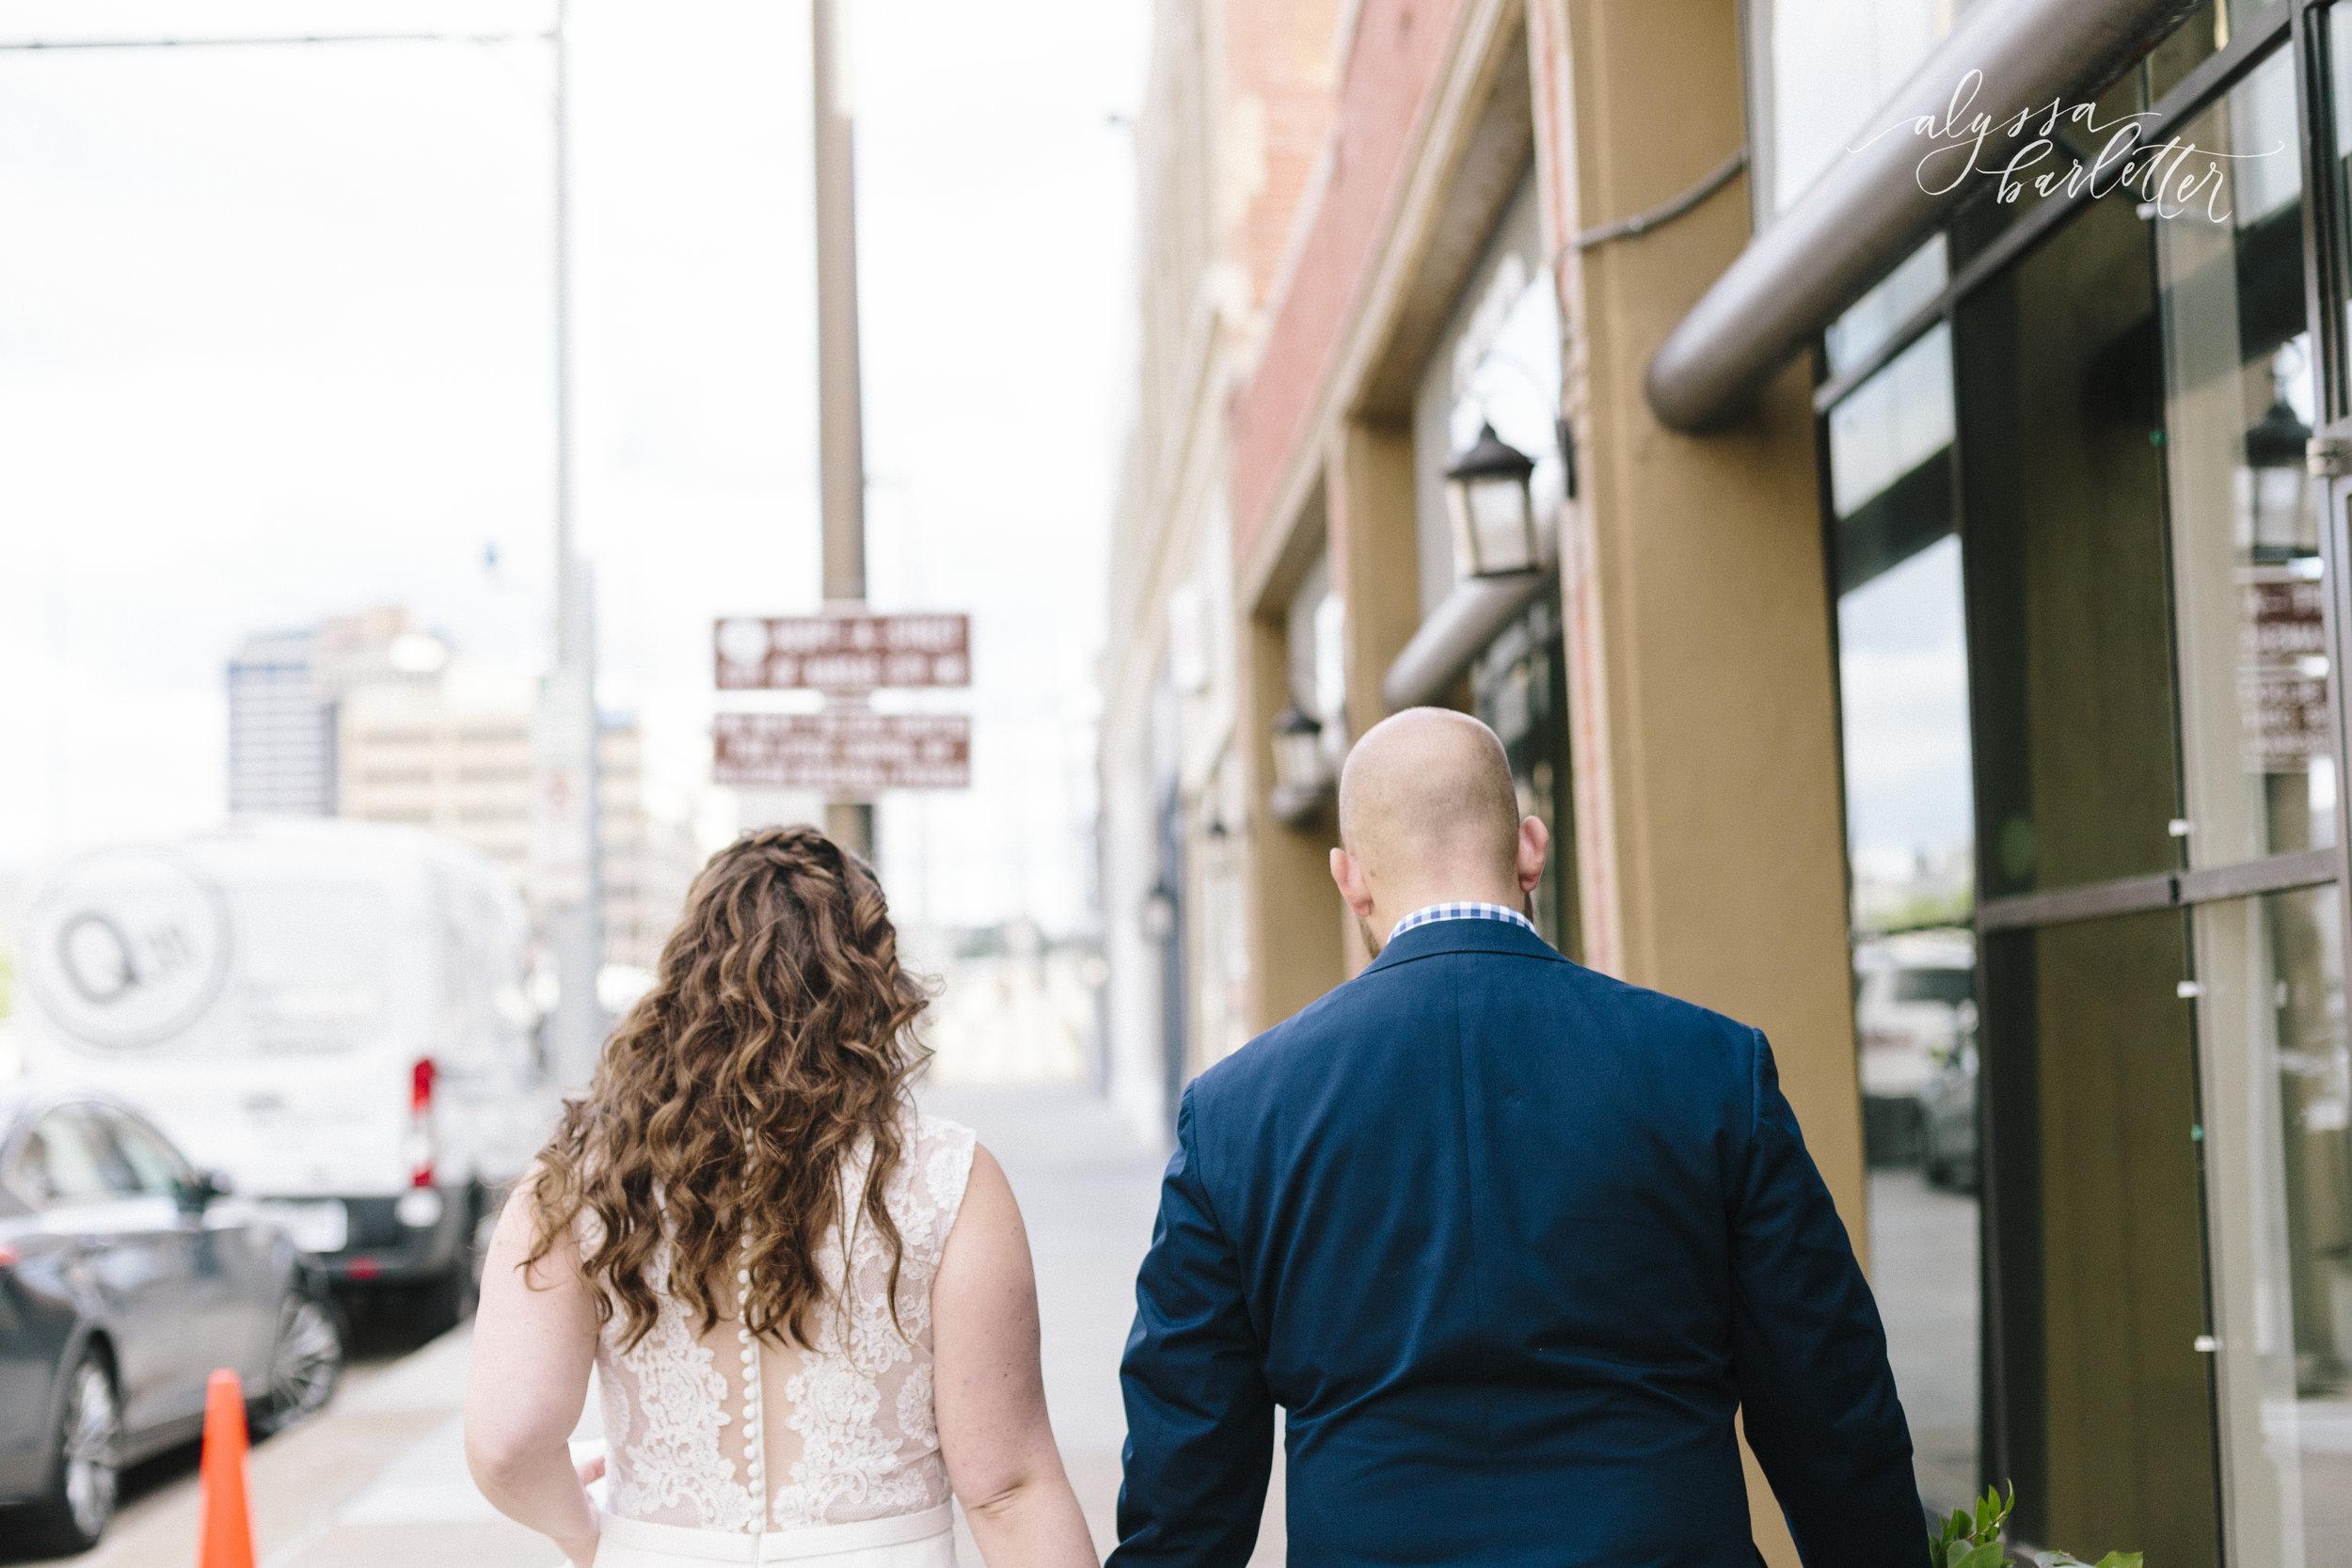 alyssa barletter photography kansas city wedding 2016 main courtney and brian-1-40.jpg